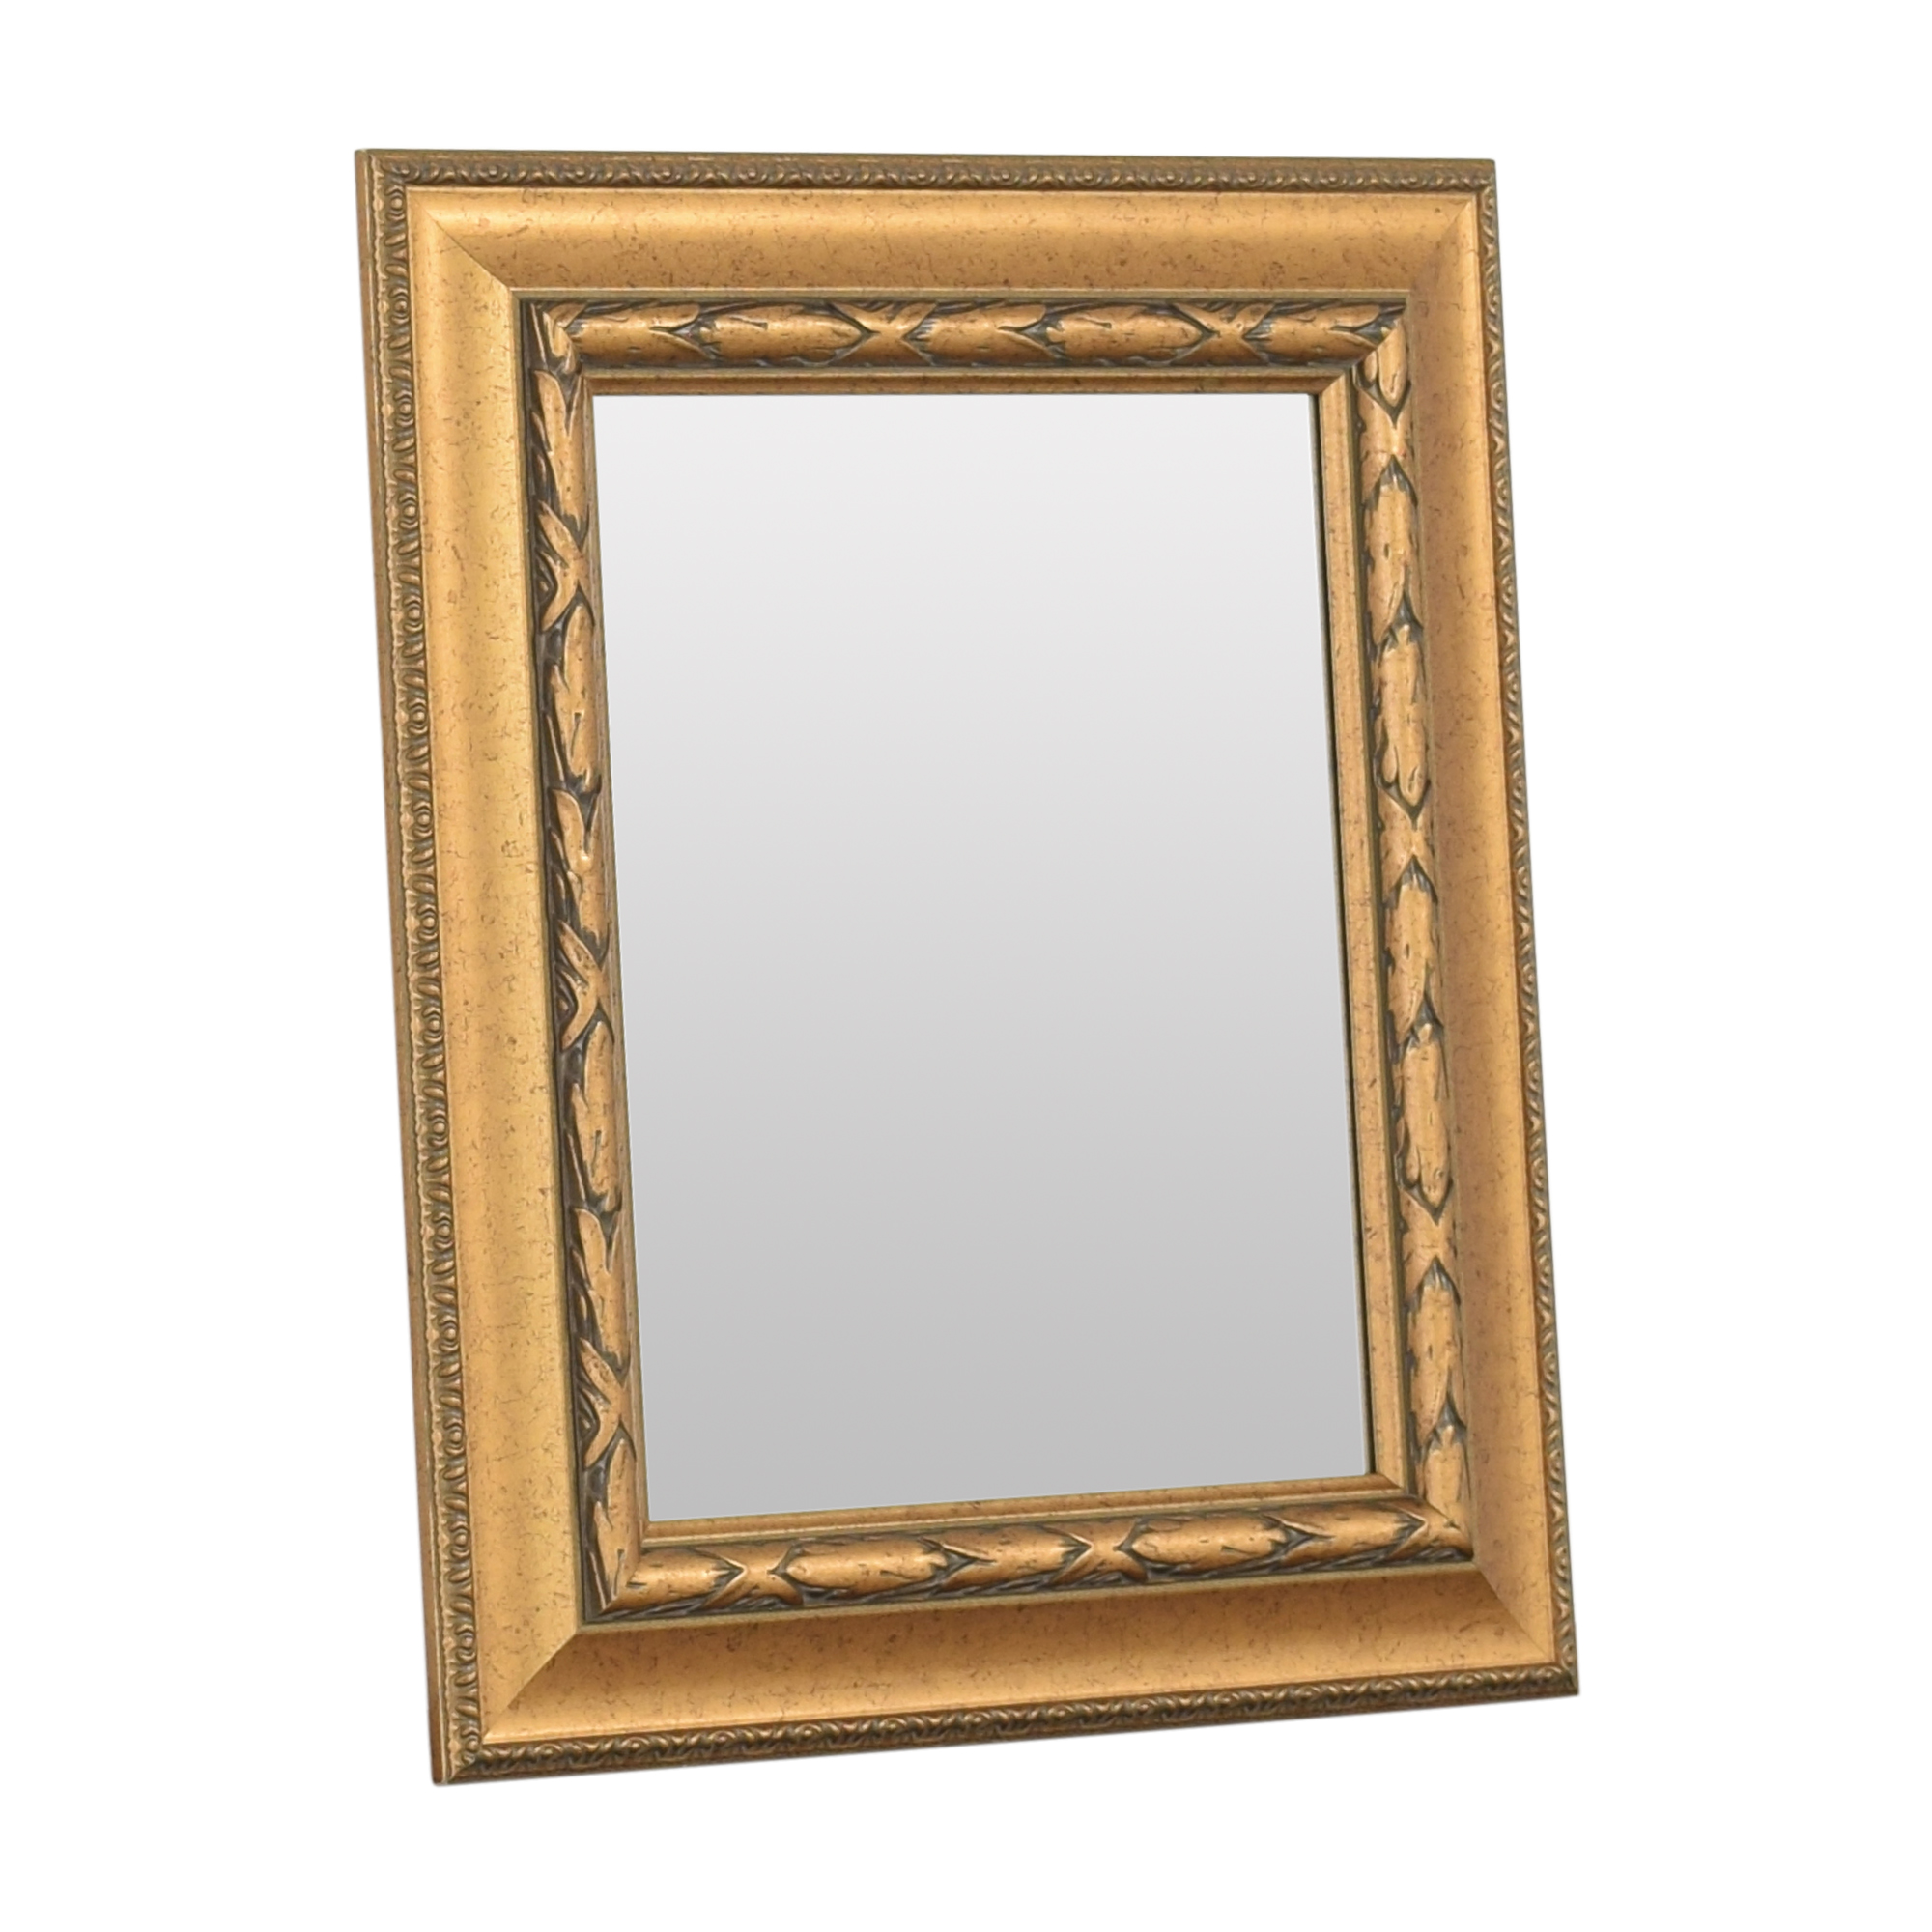 Decorative Framed Mirror sale